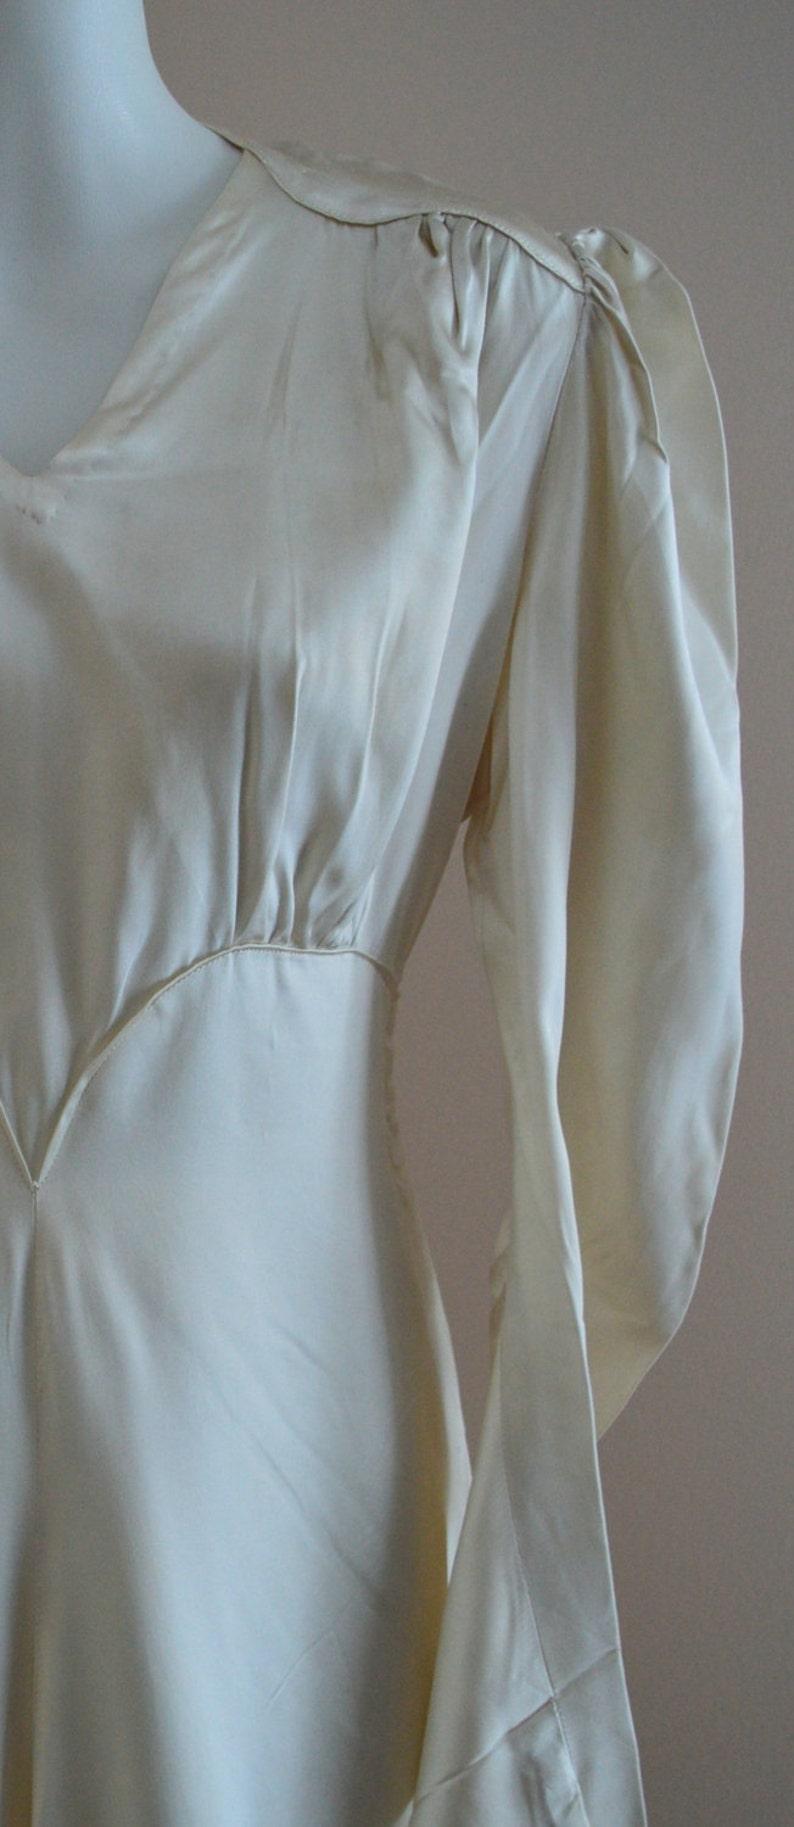 Wedding Dress Satin Wedding Dress Vintage 1920s Mother of Pearl Heavy Satin Wedding Dress 1920s Dress 1920s Wedding Dress